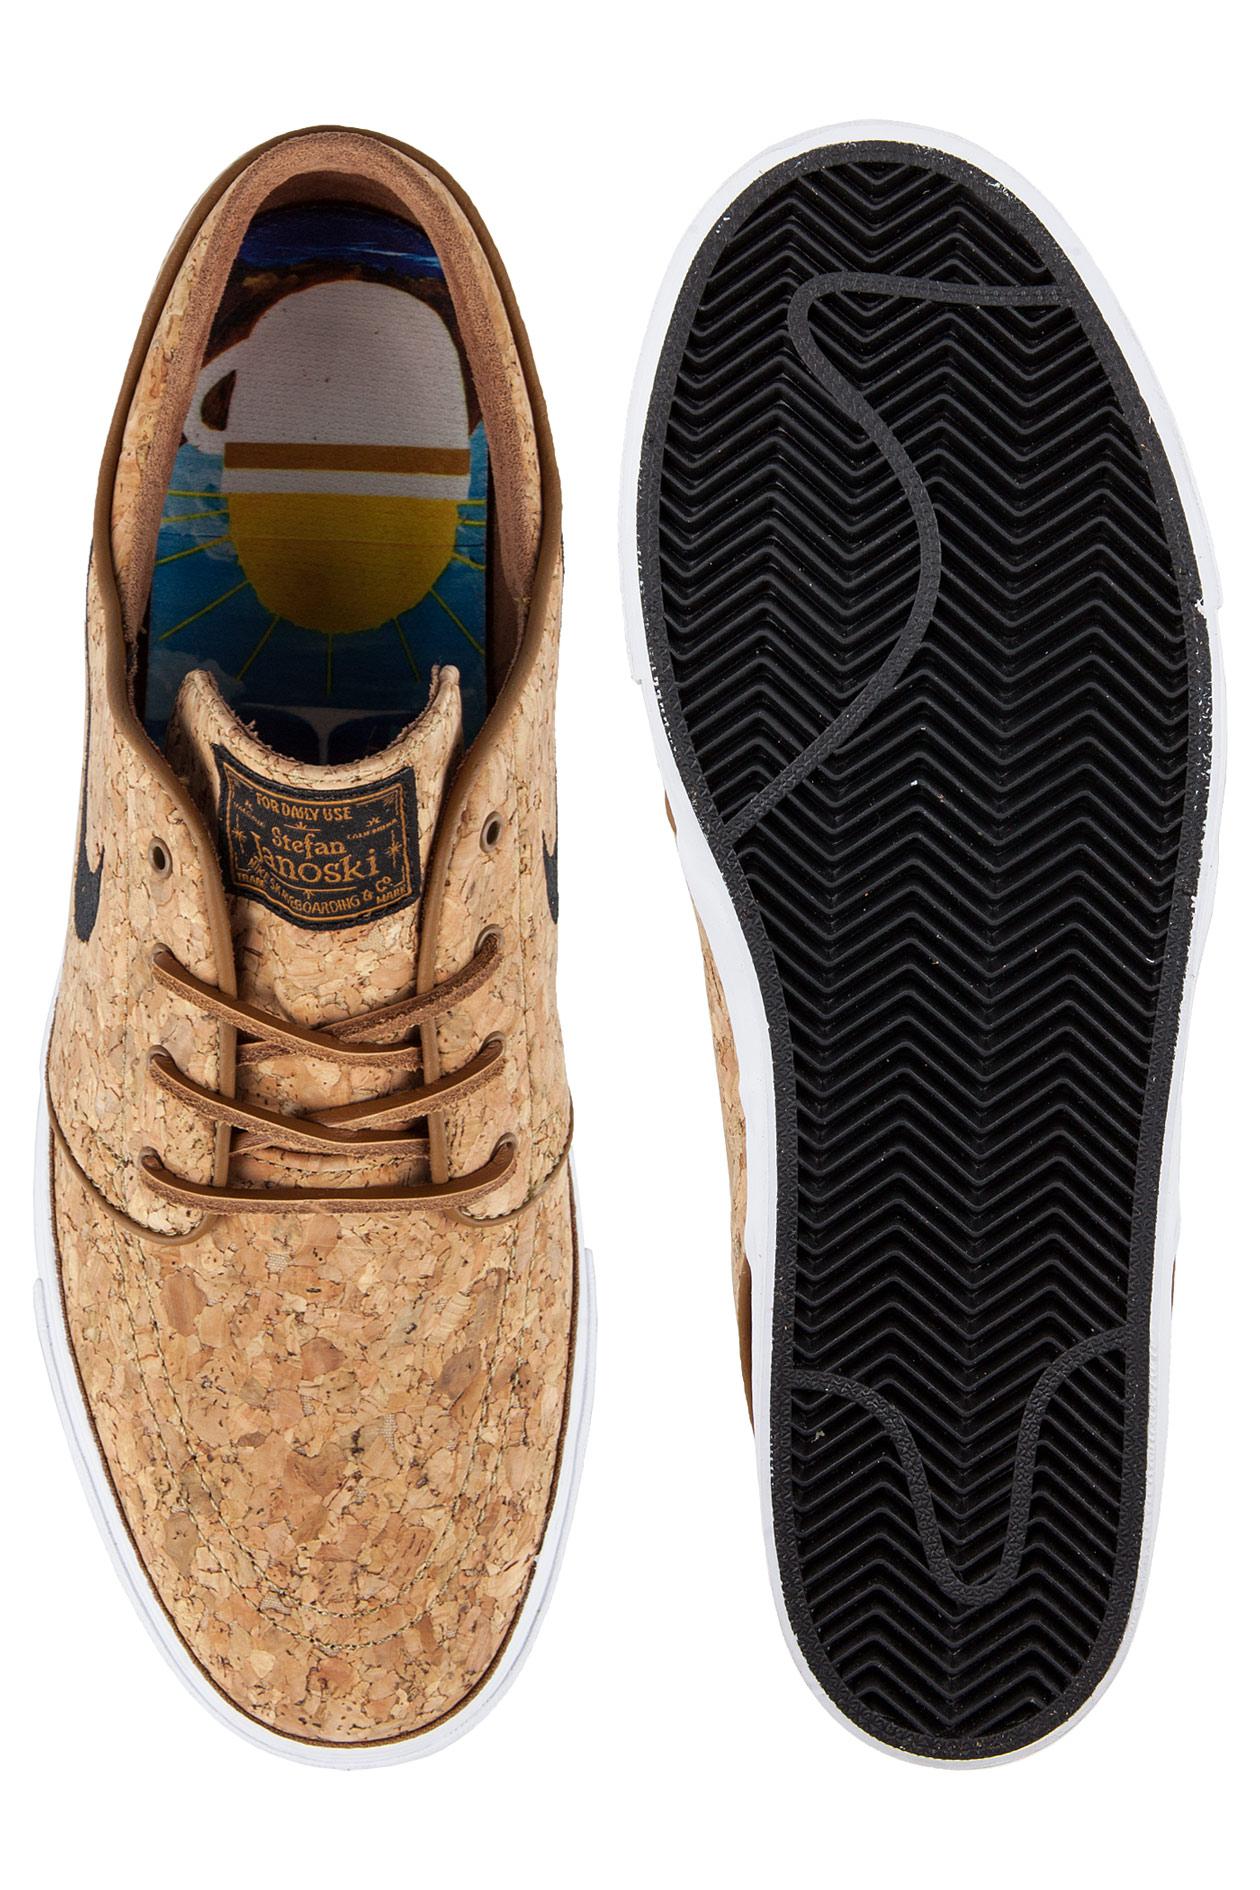 Nike Cork Shoes Reviews